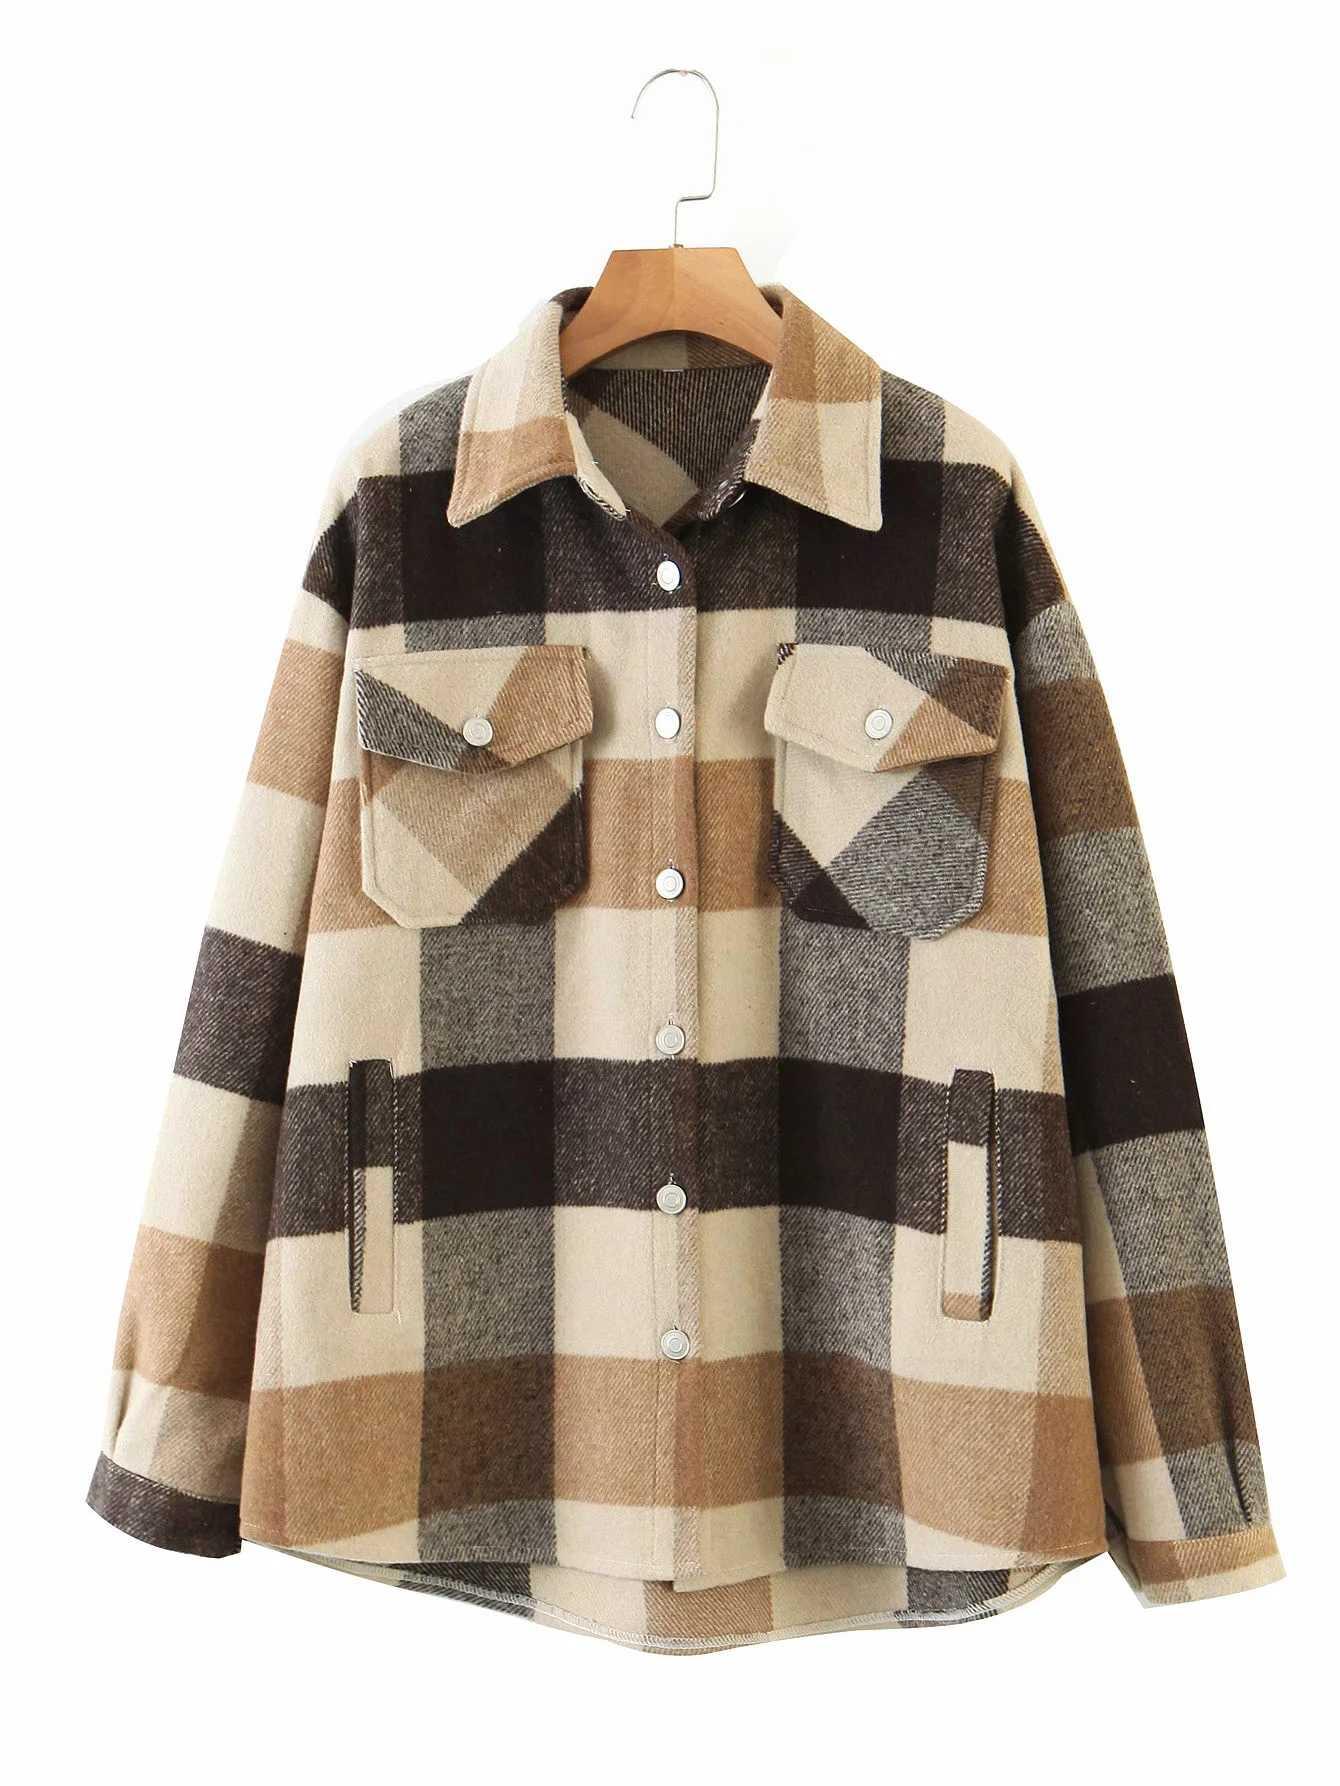 Vintage Groene Rooster Shirt Jassen Womens Losse Plaid Jas 2020 Winter Plus Size Jassen Casual Vrouwen Jas 2020